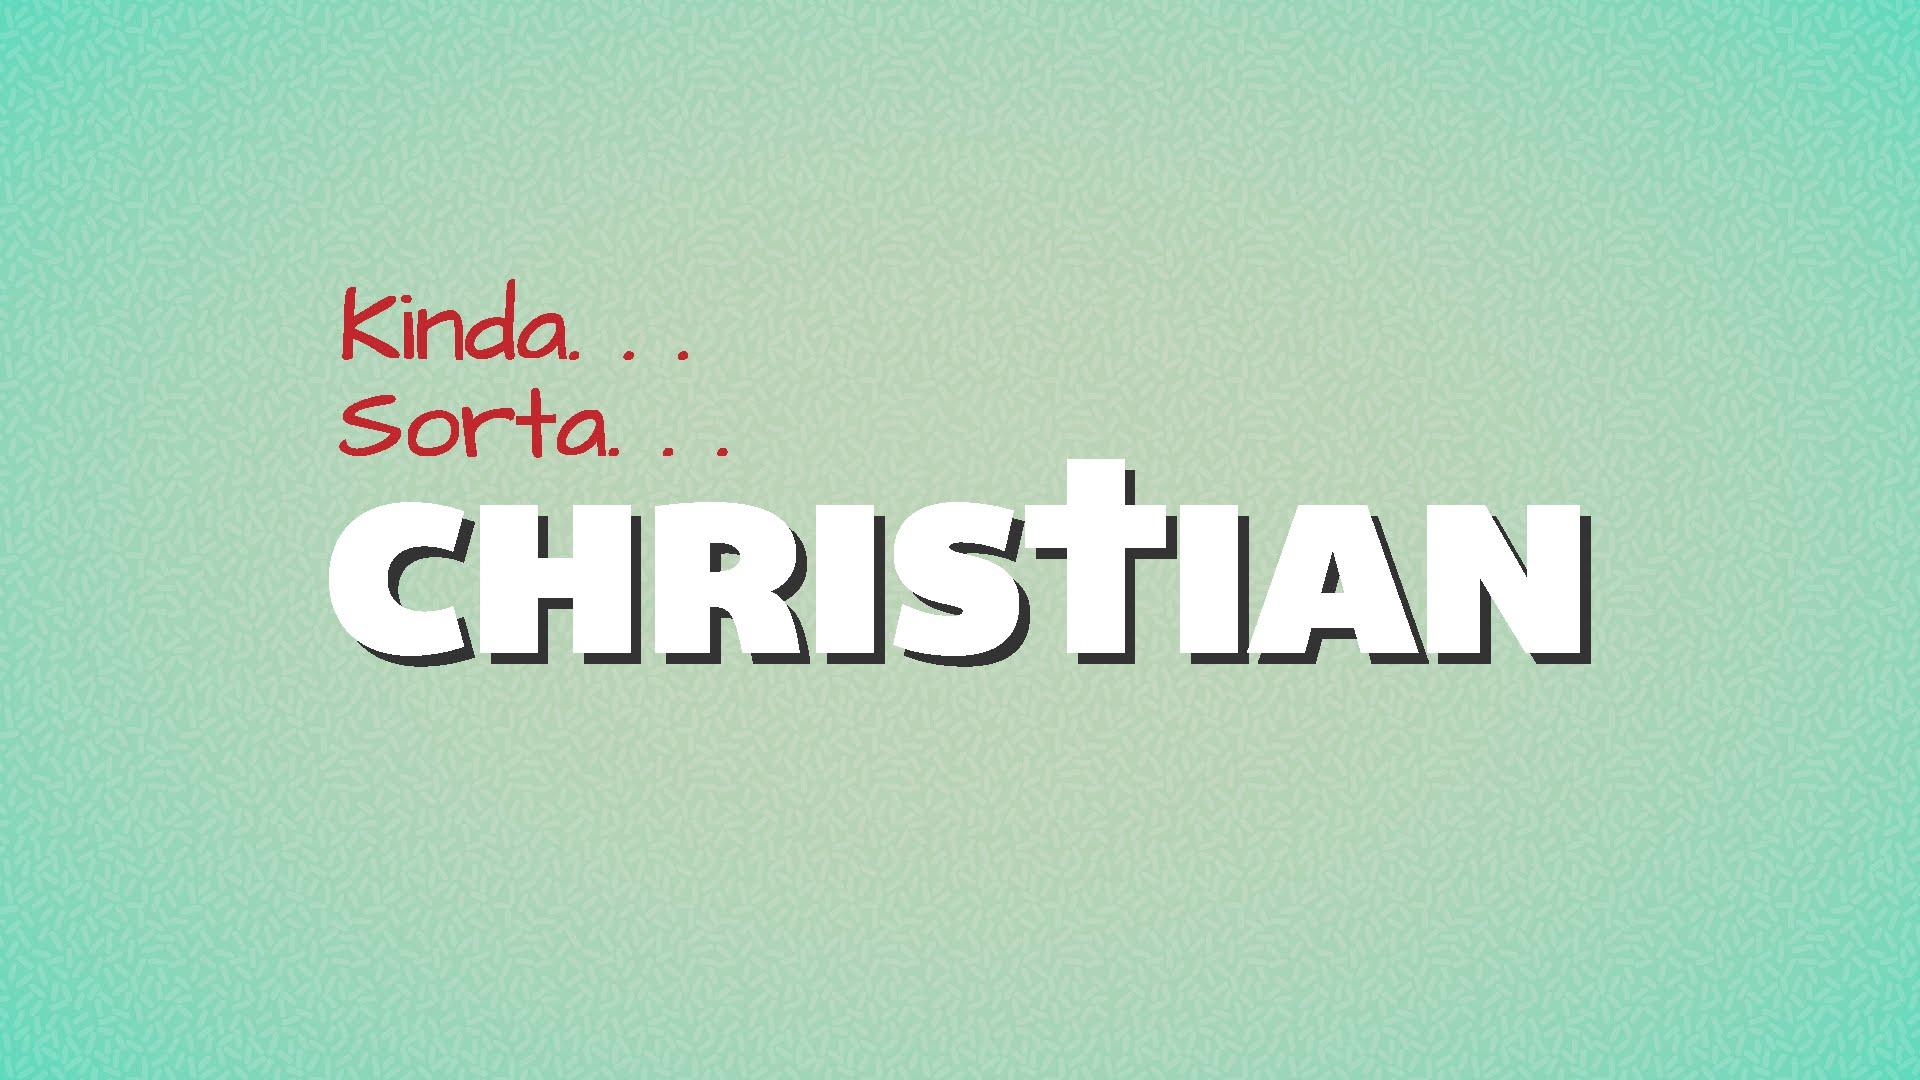 Kinda Sorta Christian: I Believe in God, but Don't Trust Him Fully